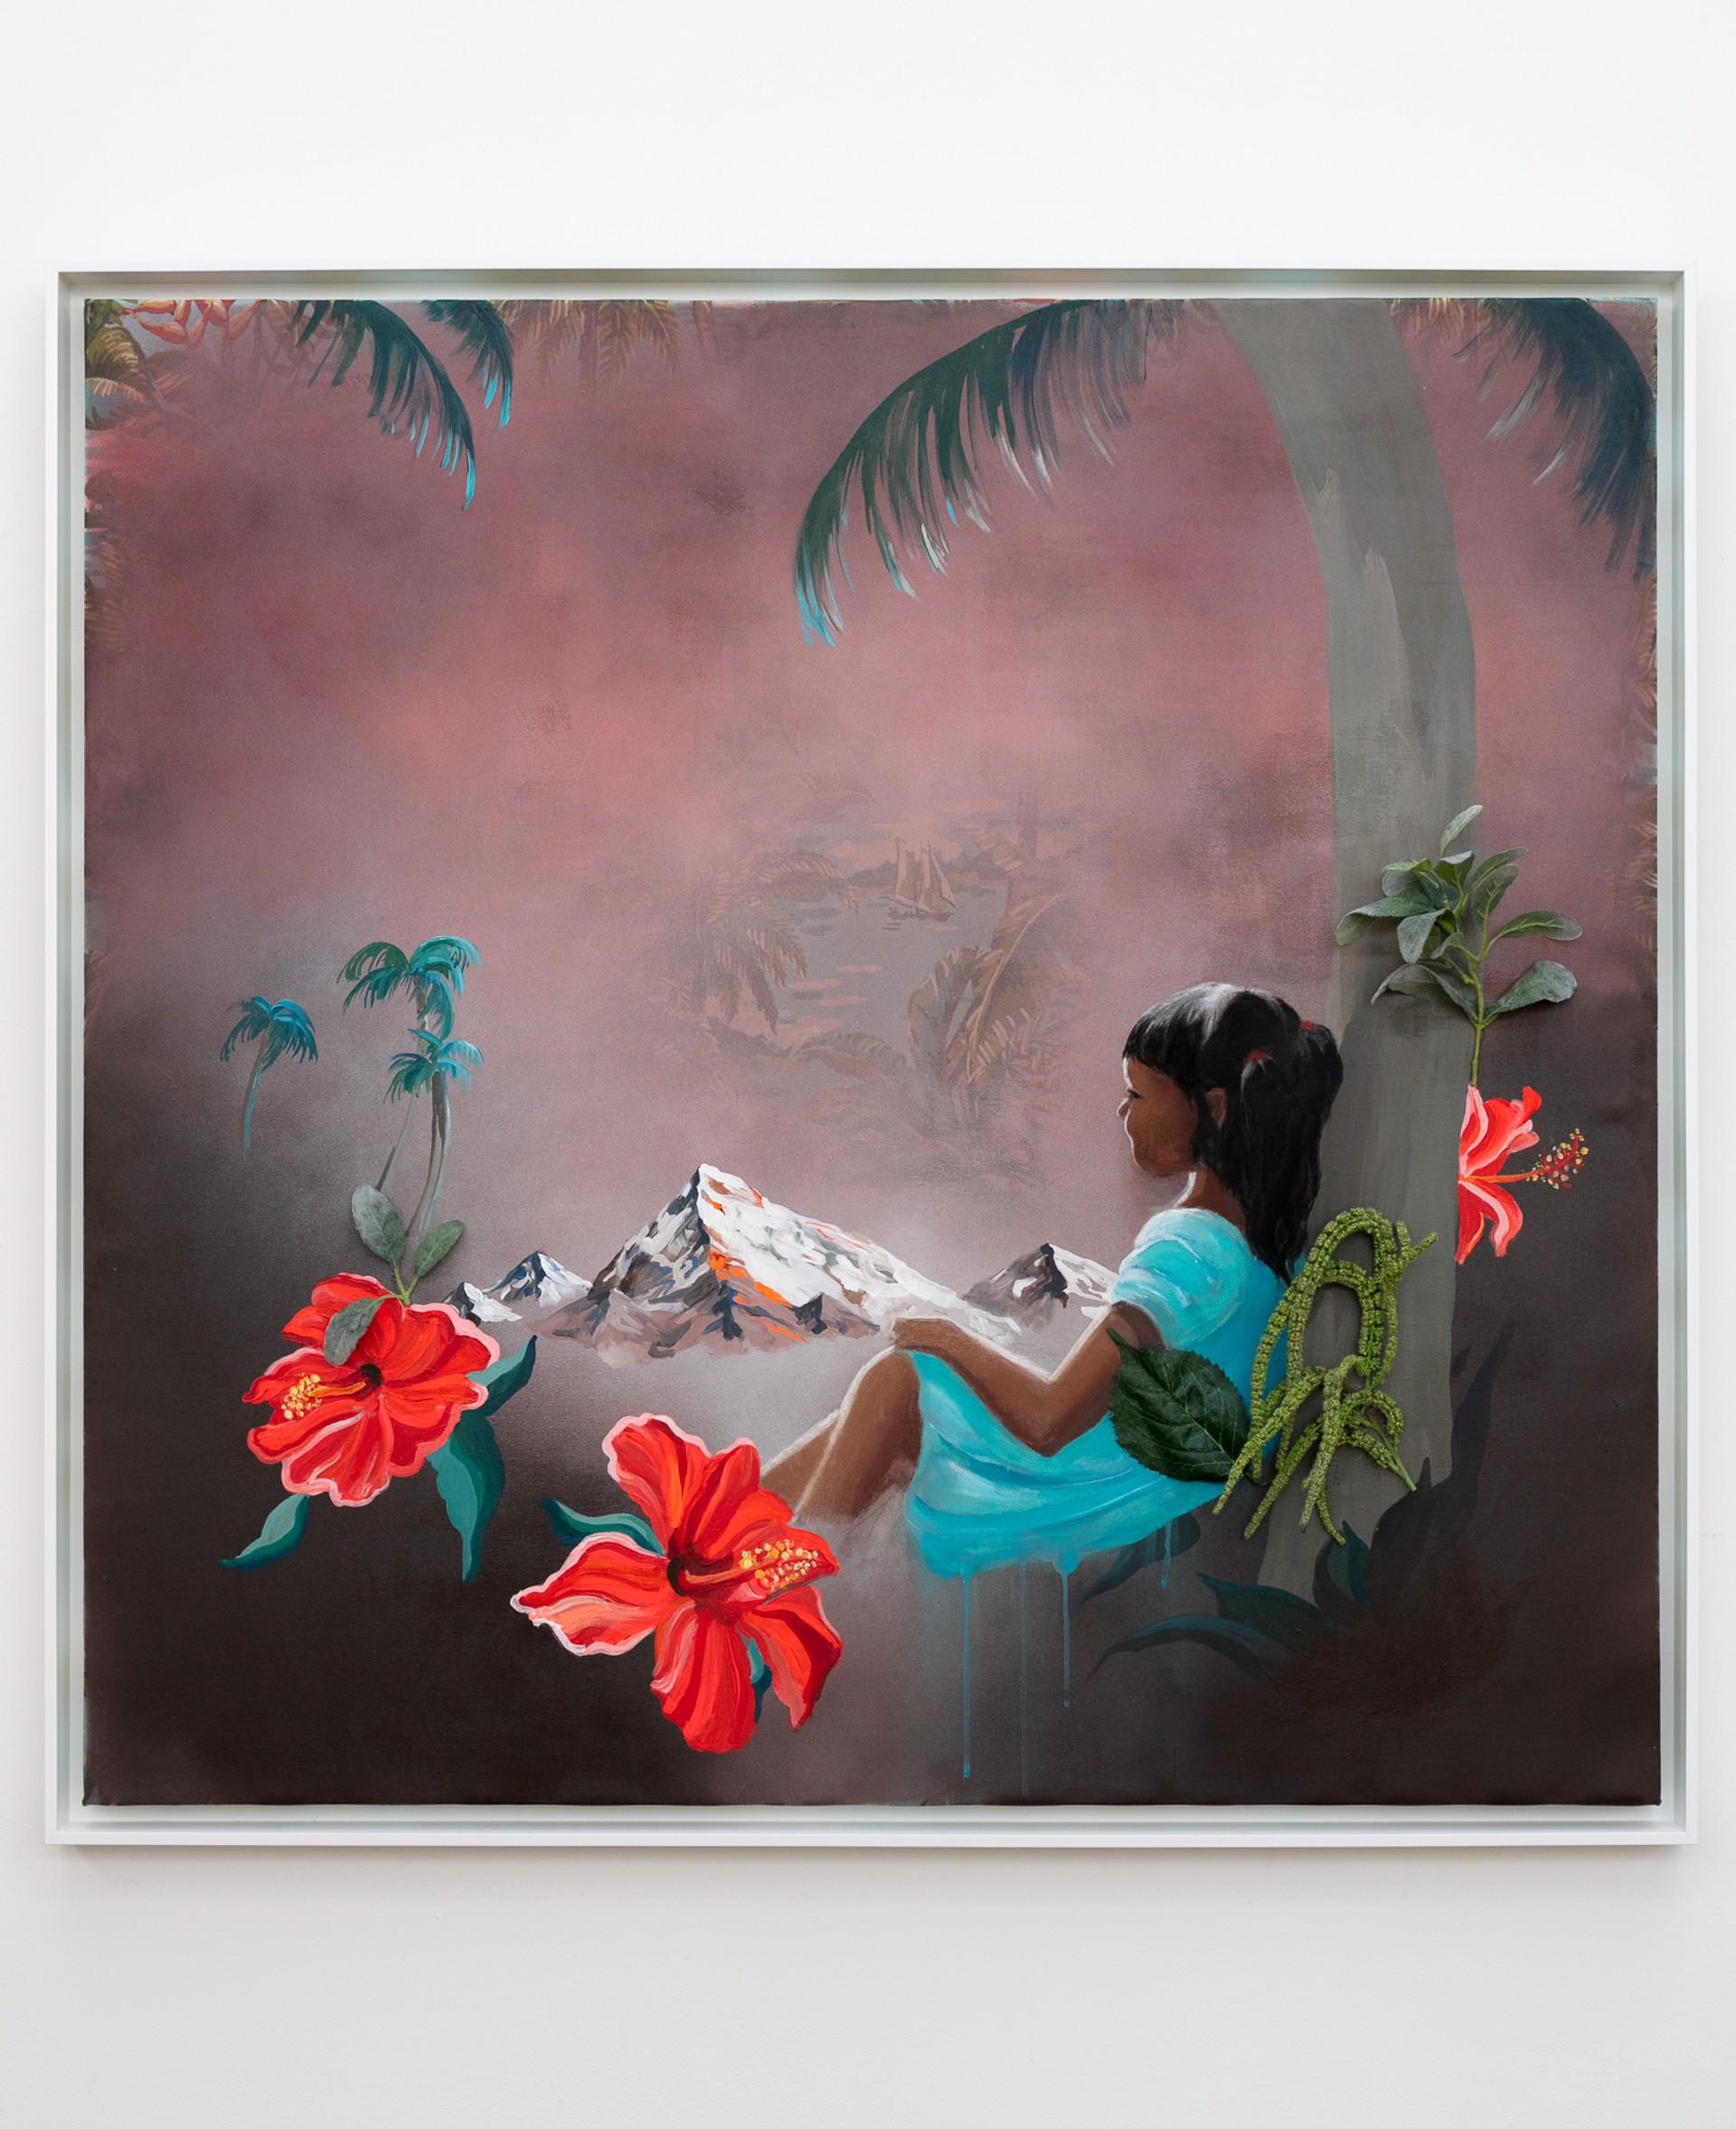 A Dream Within a Dream Within a Dream by Suchitra Mattai